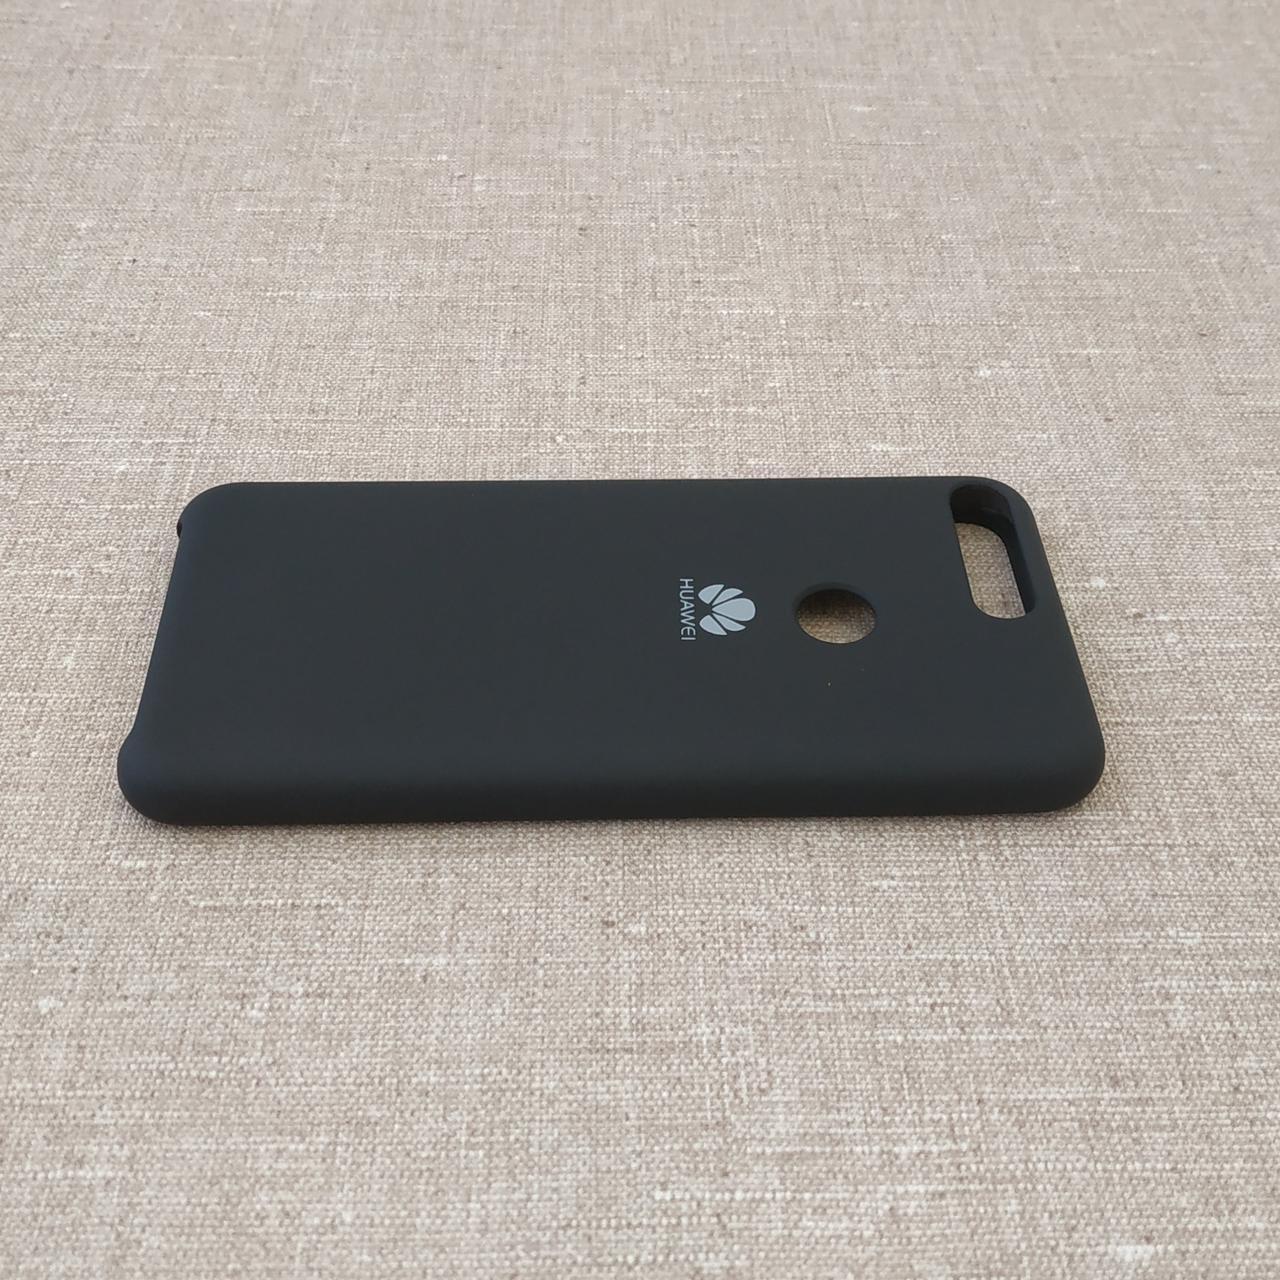 Original Soft Huawei Y7 Prime 2018 black